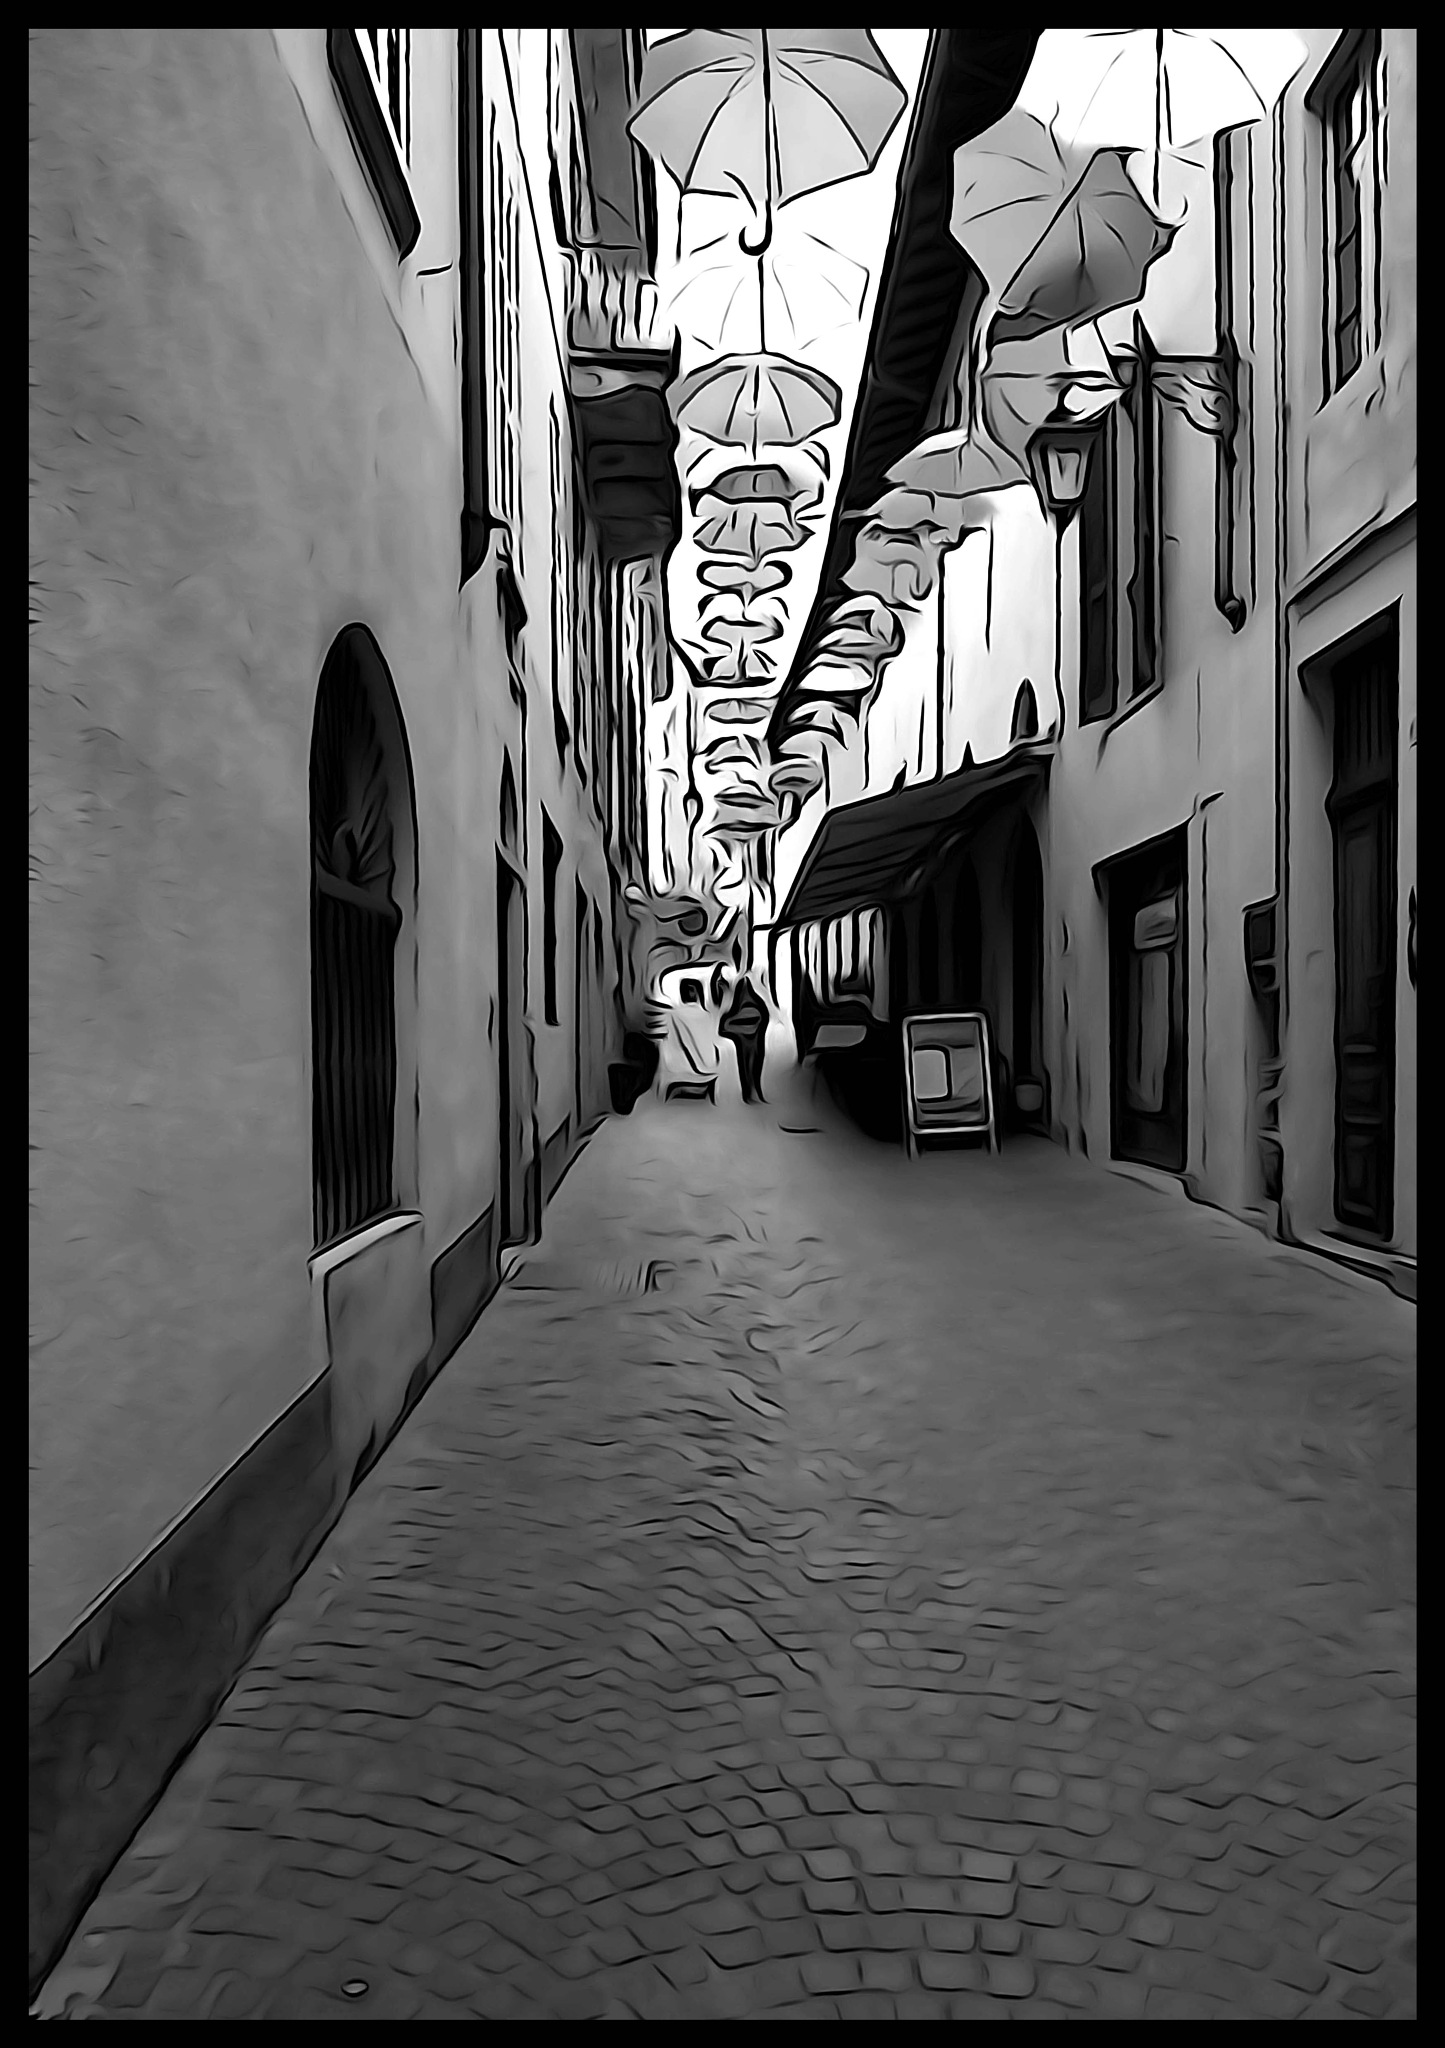 vicolo, arona by bcorech